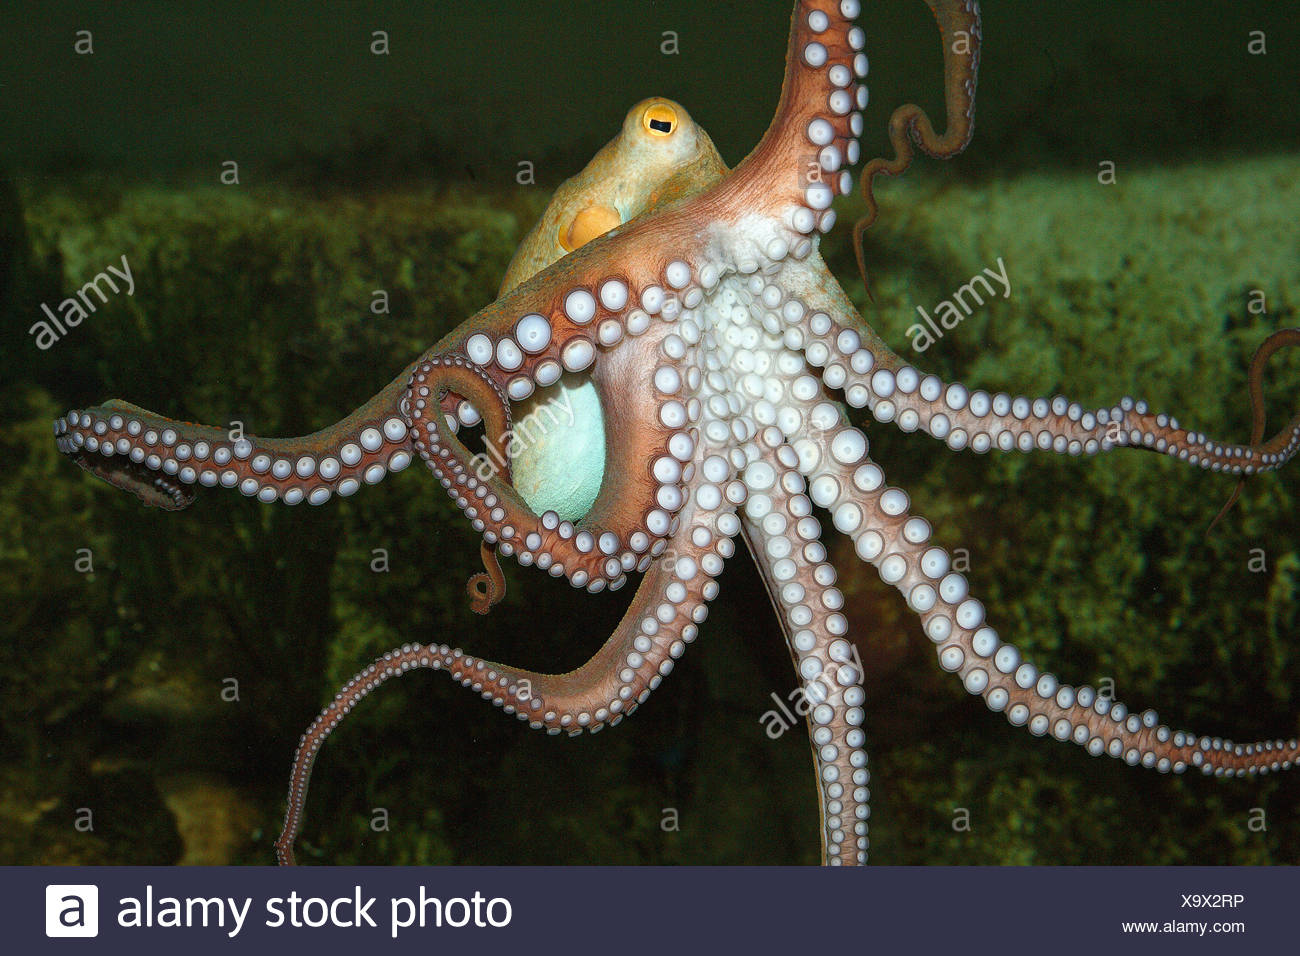 Berühmt Oktopus Färbung Seite Fotos - Malvorlagen-Ideen ...